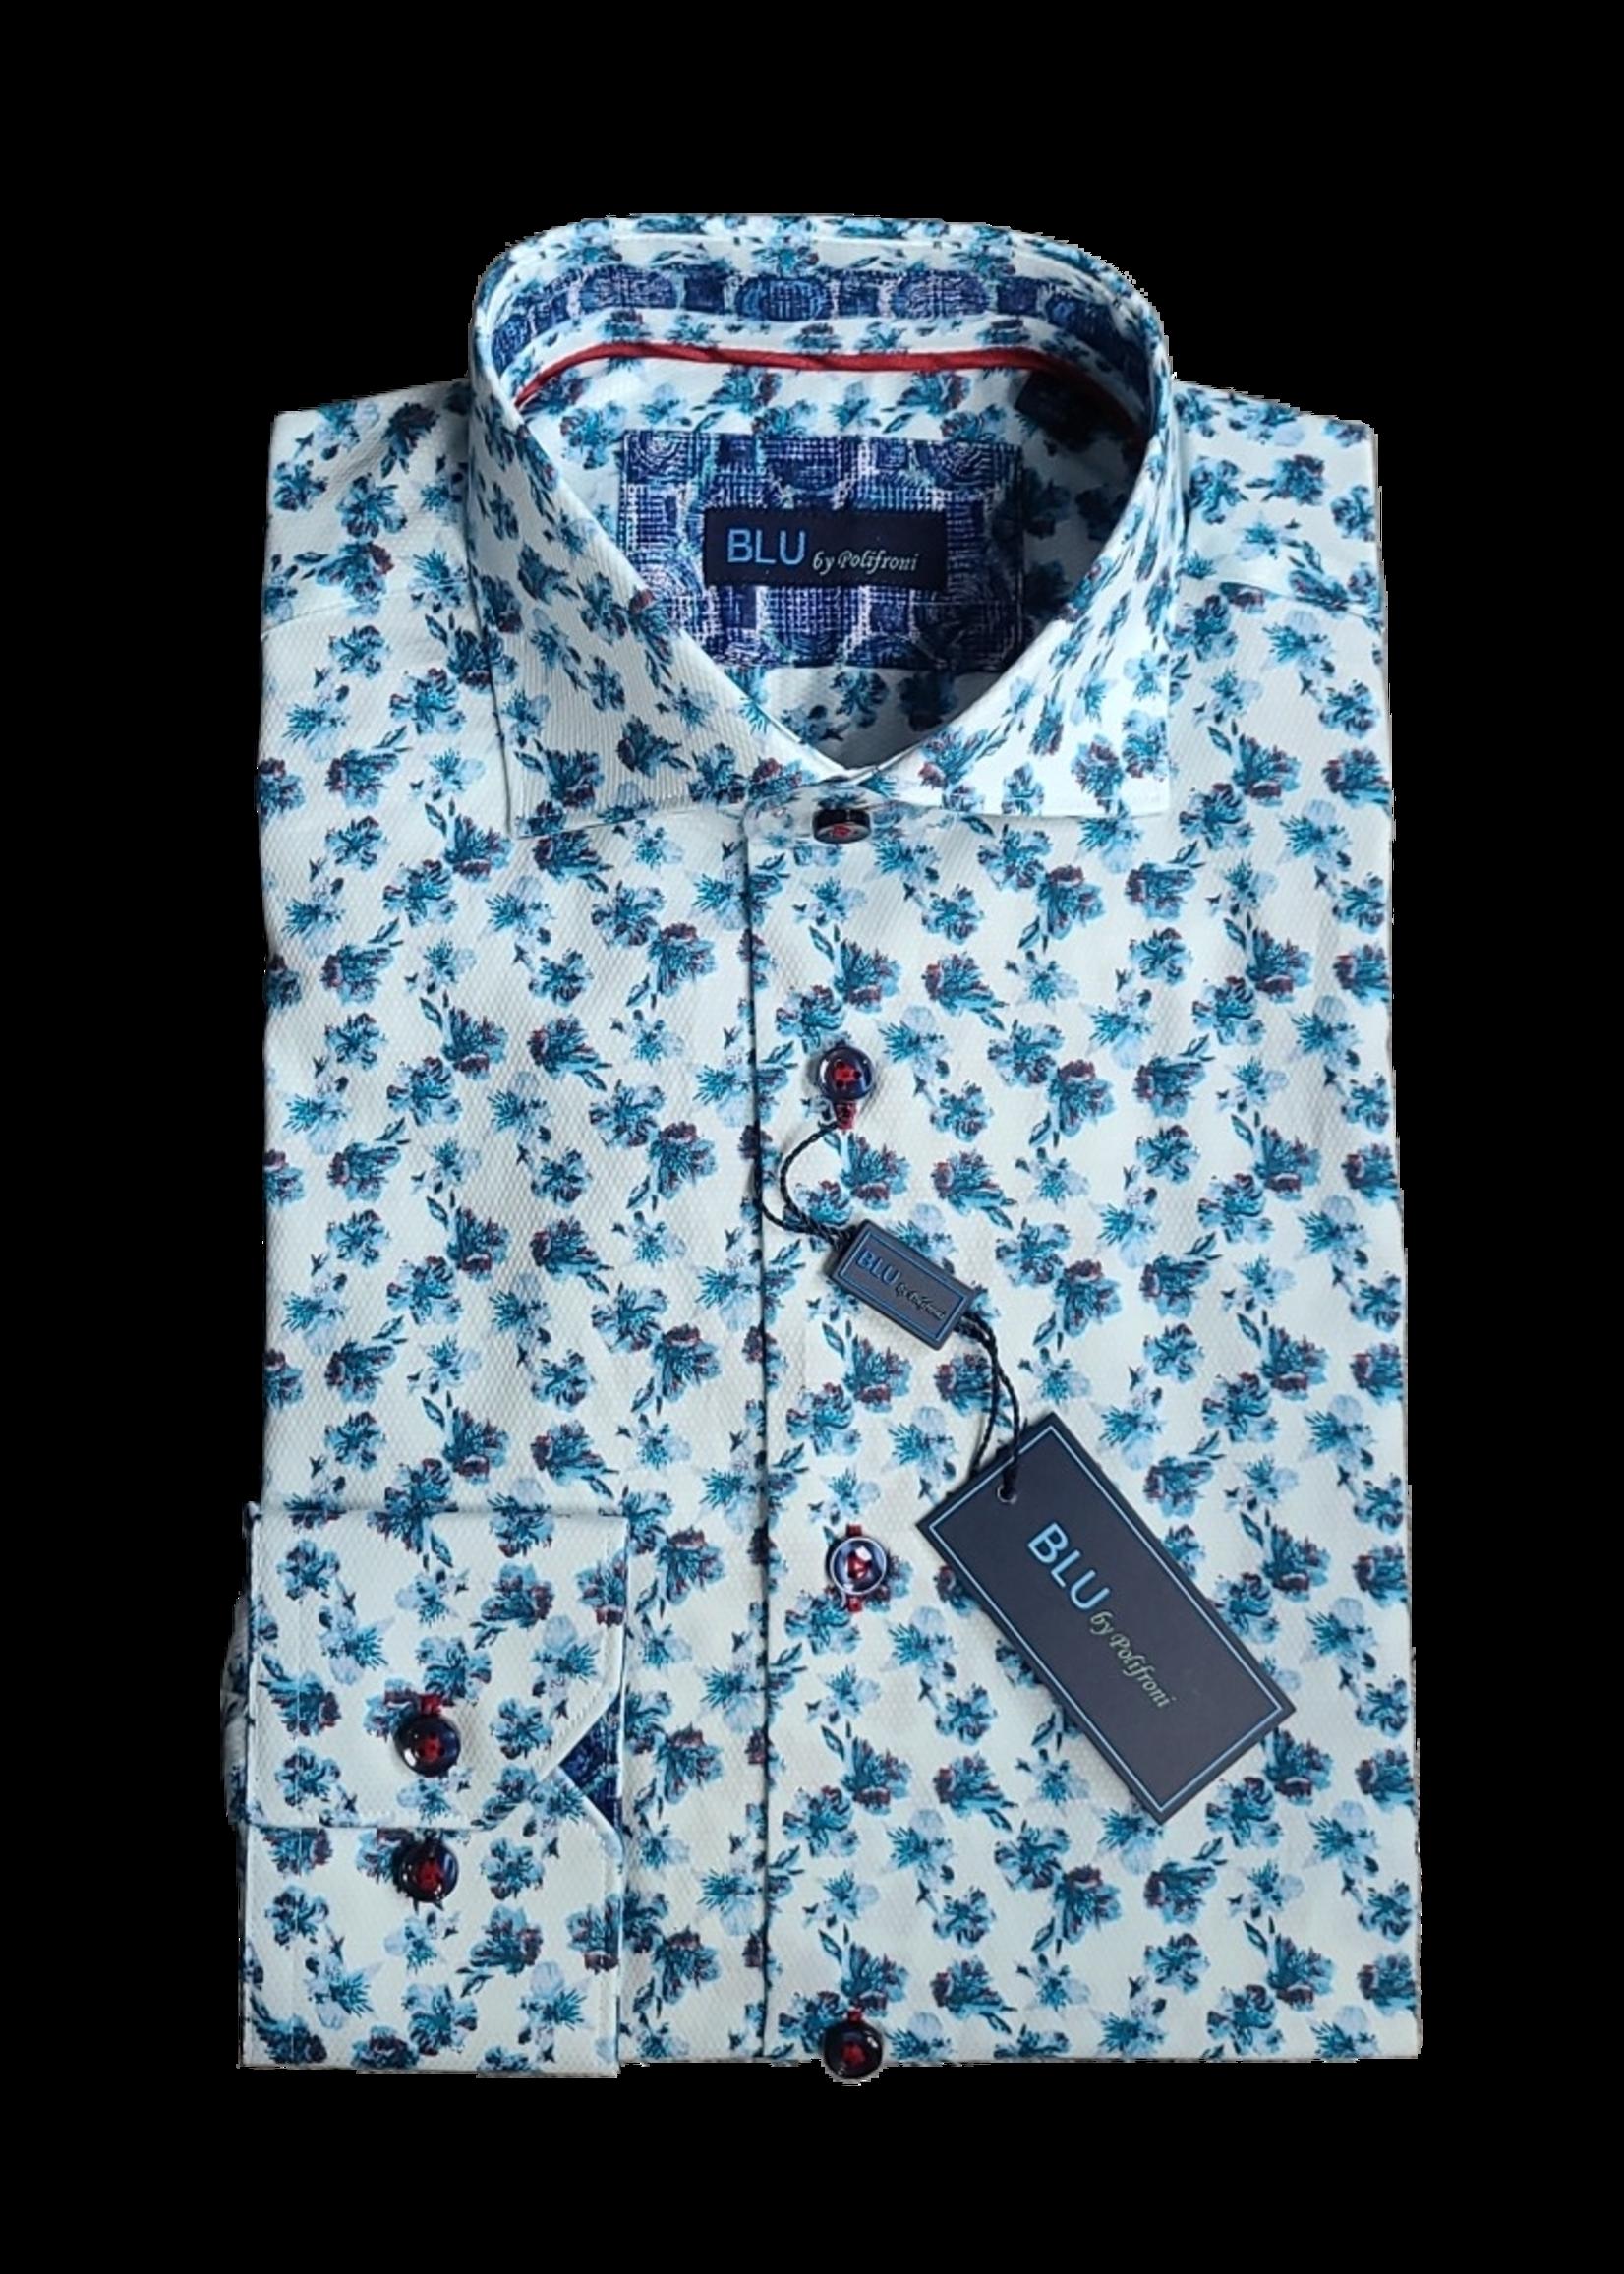 Blu Polifroni BLU B2149533 Shirt